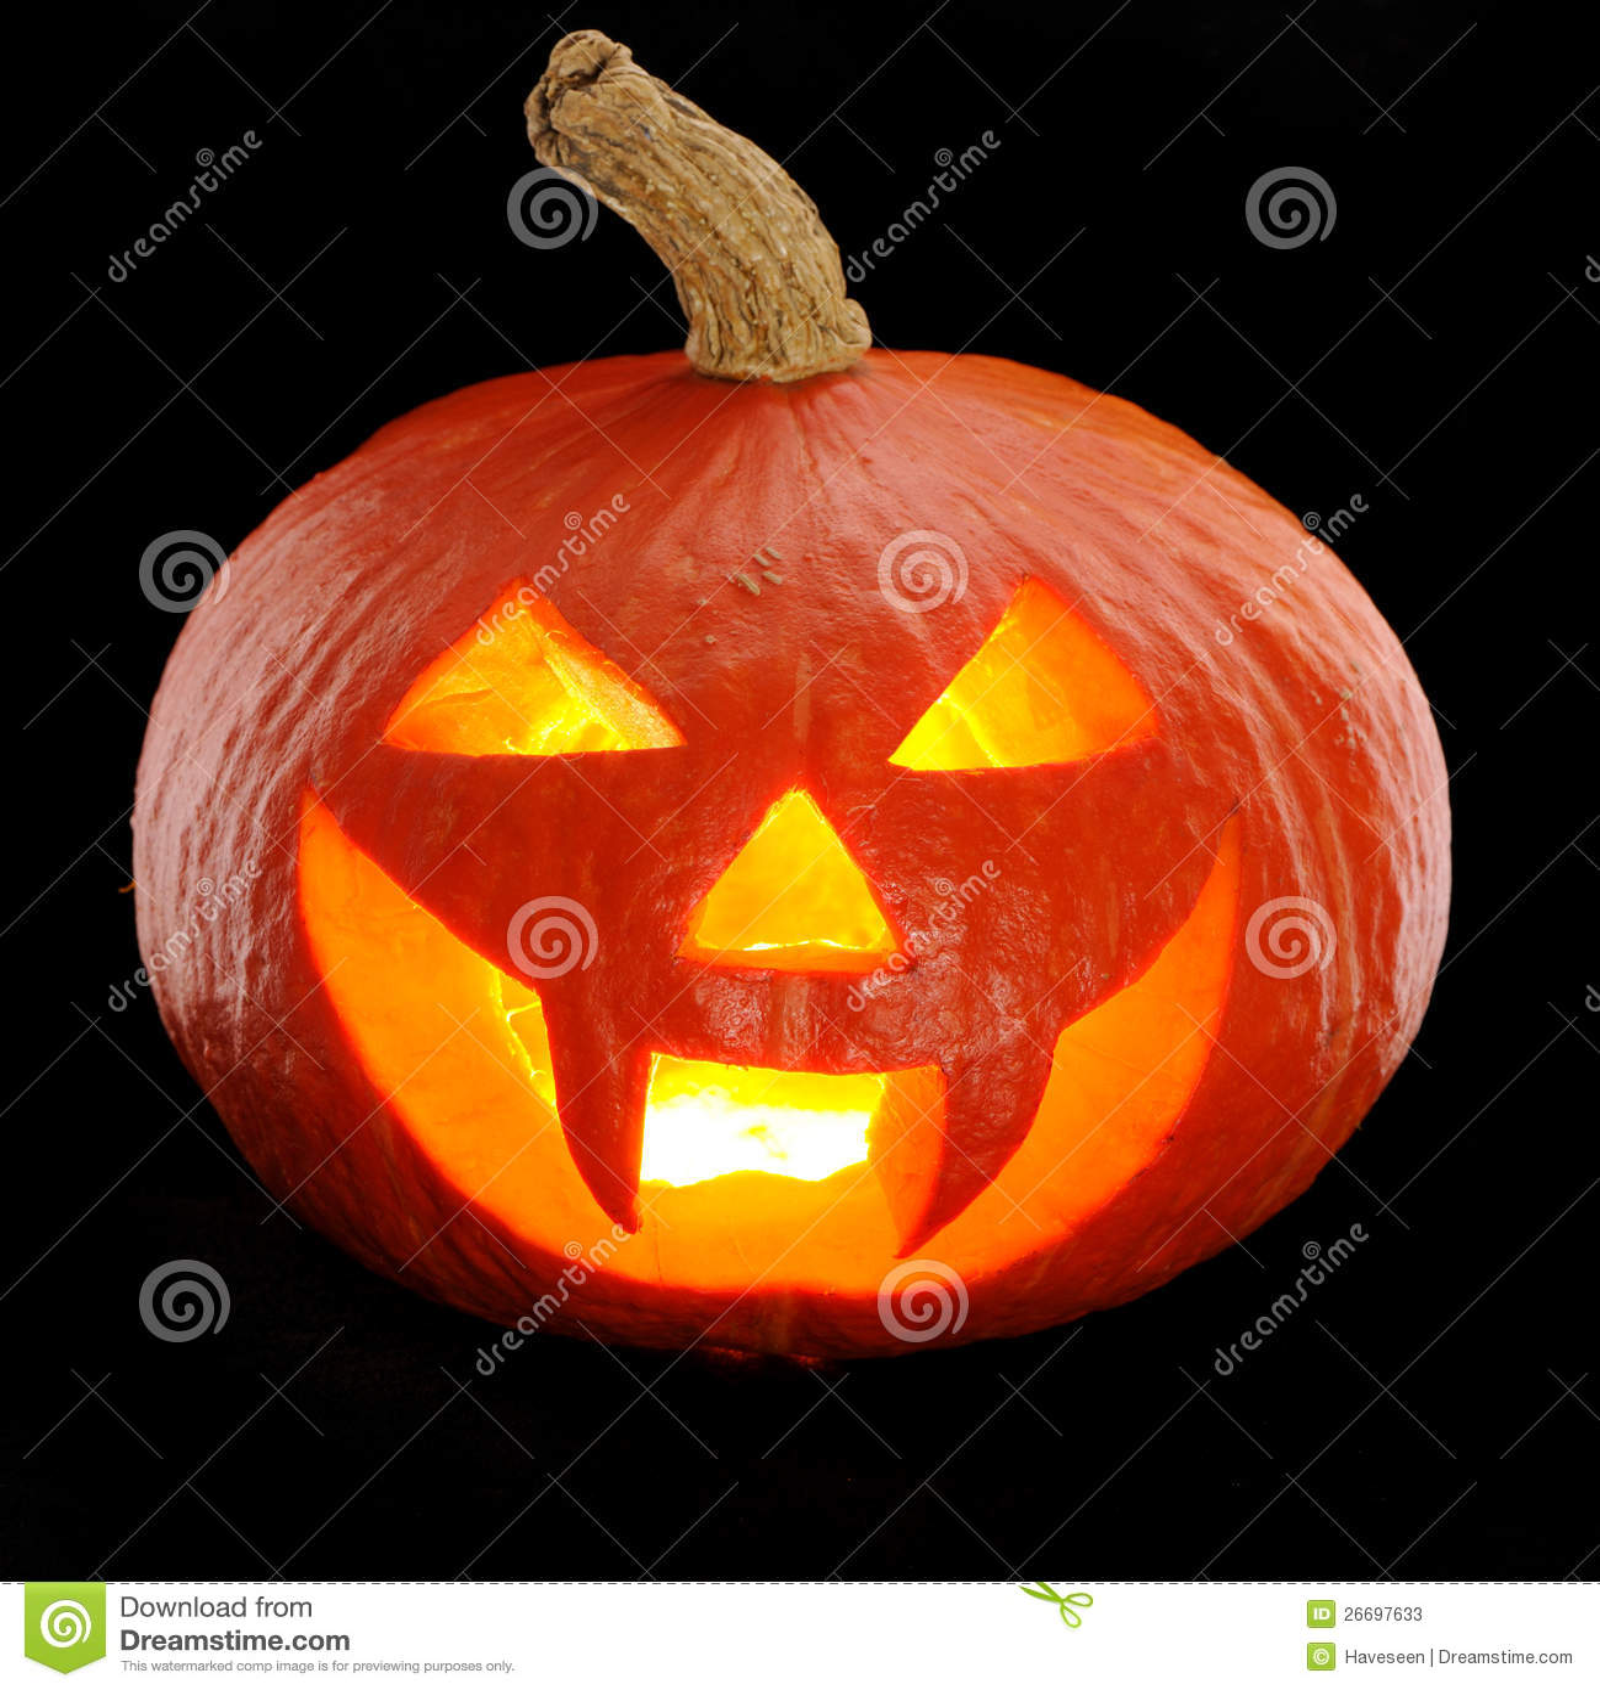 Halloween Pumpkin Jack O Lantern Stock Image Image Of